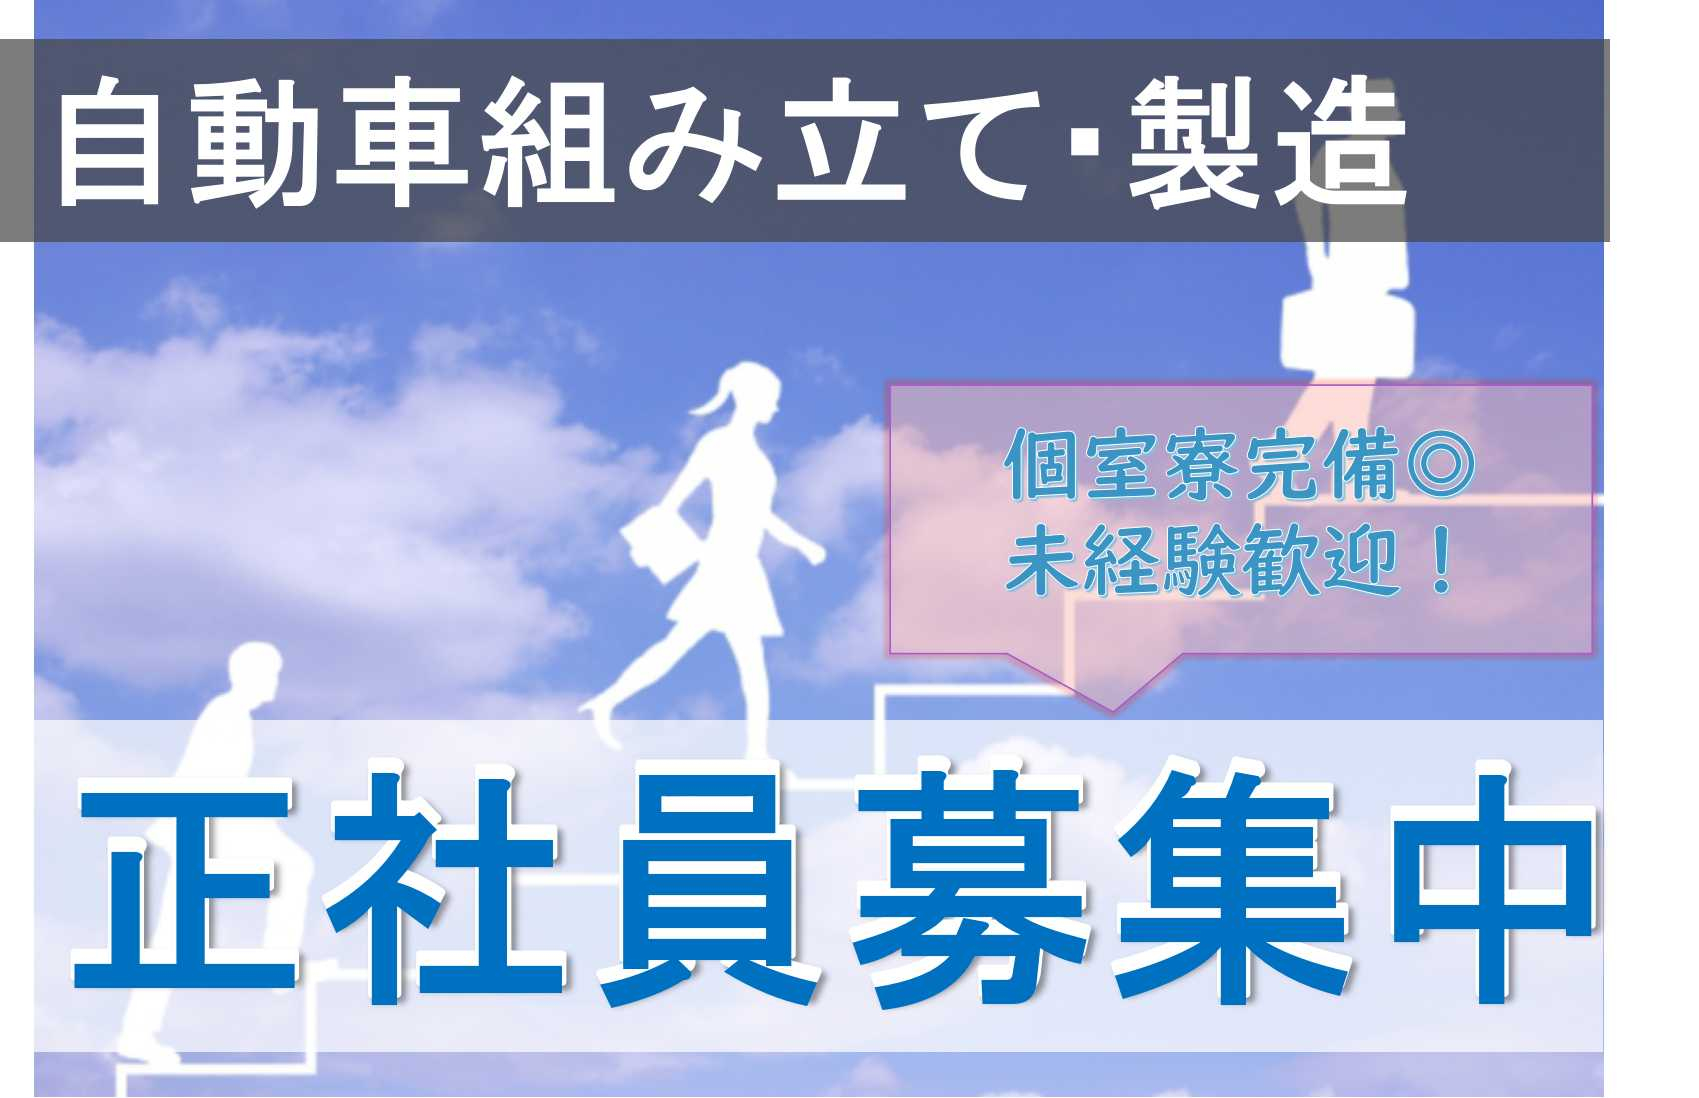 【寮完備】岡崎市勤務!未経験OK★自動車組み立て・製造【即面談可能】 イメージ